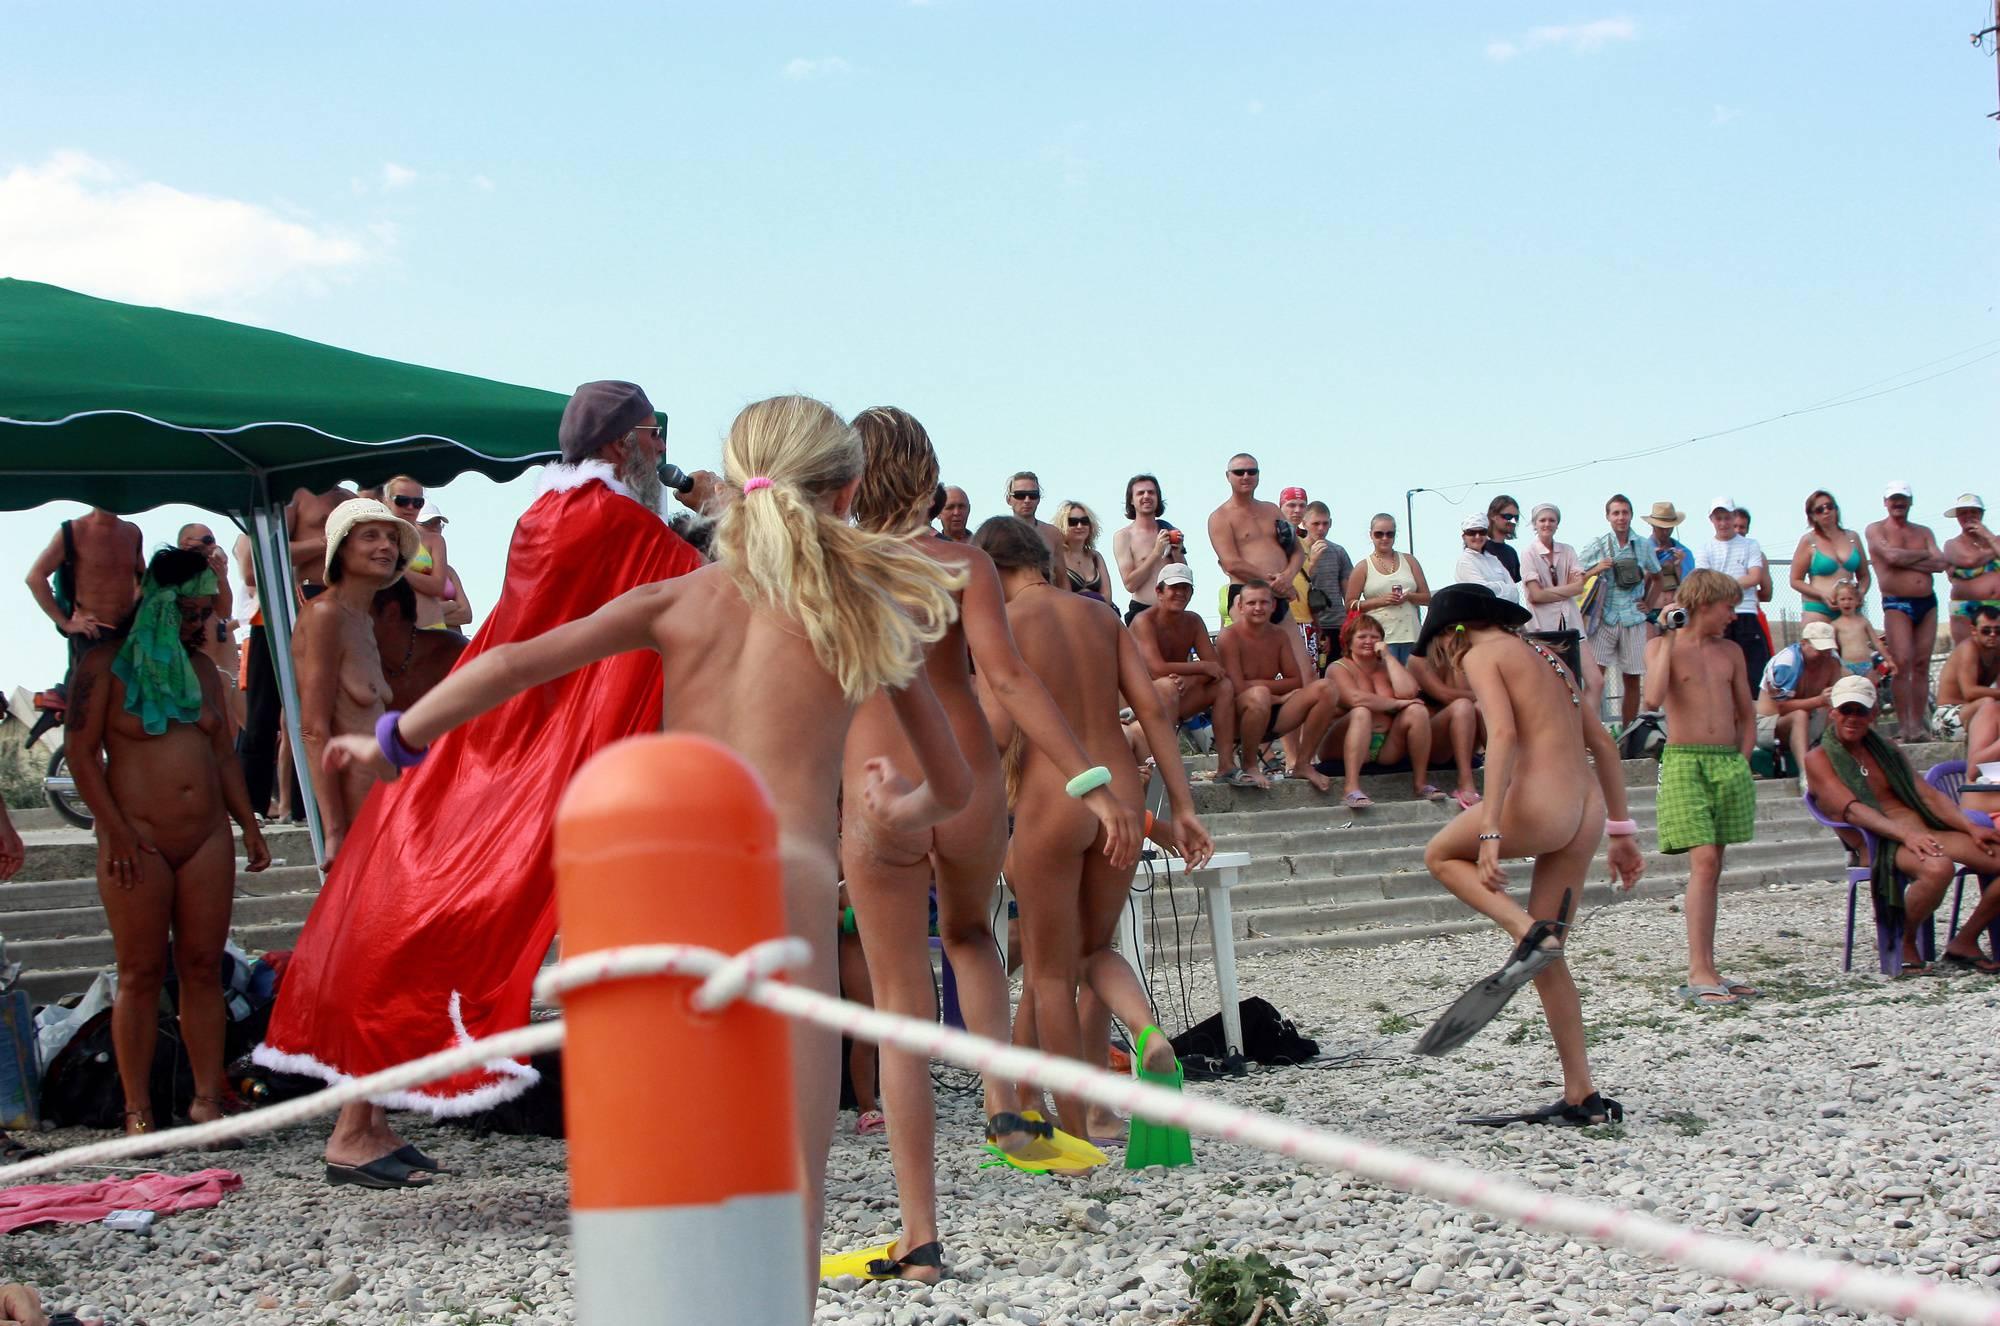 Nudist Pics Kids Nudist Chase Game - 1